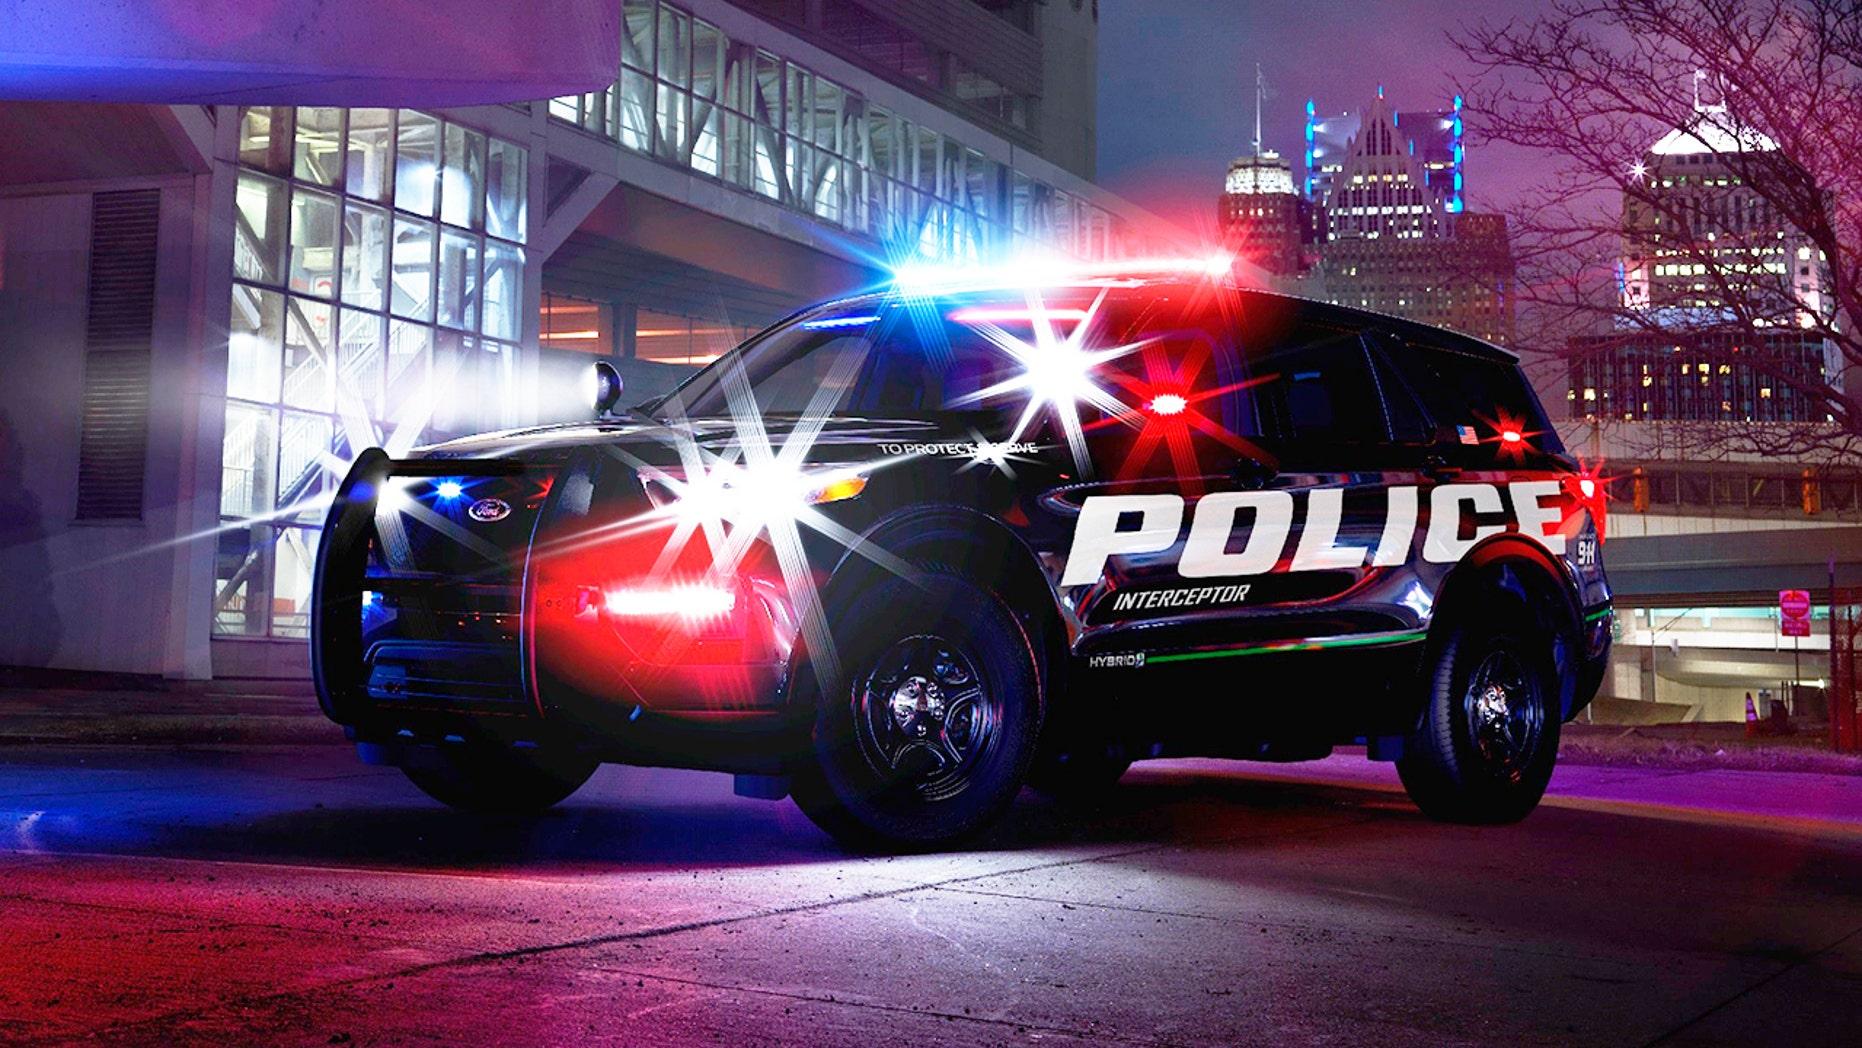 2020 Ford Police Interceptor Utility - Used Car Reviews Review Release RaiaCars.com